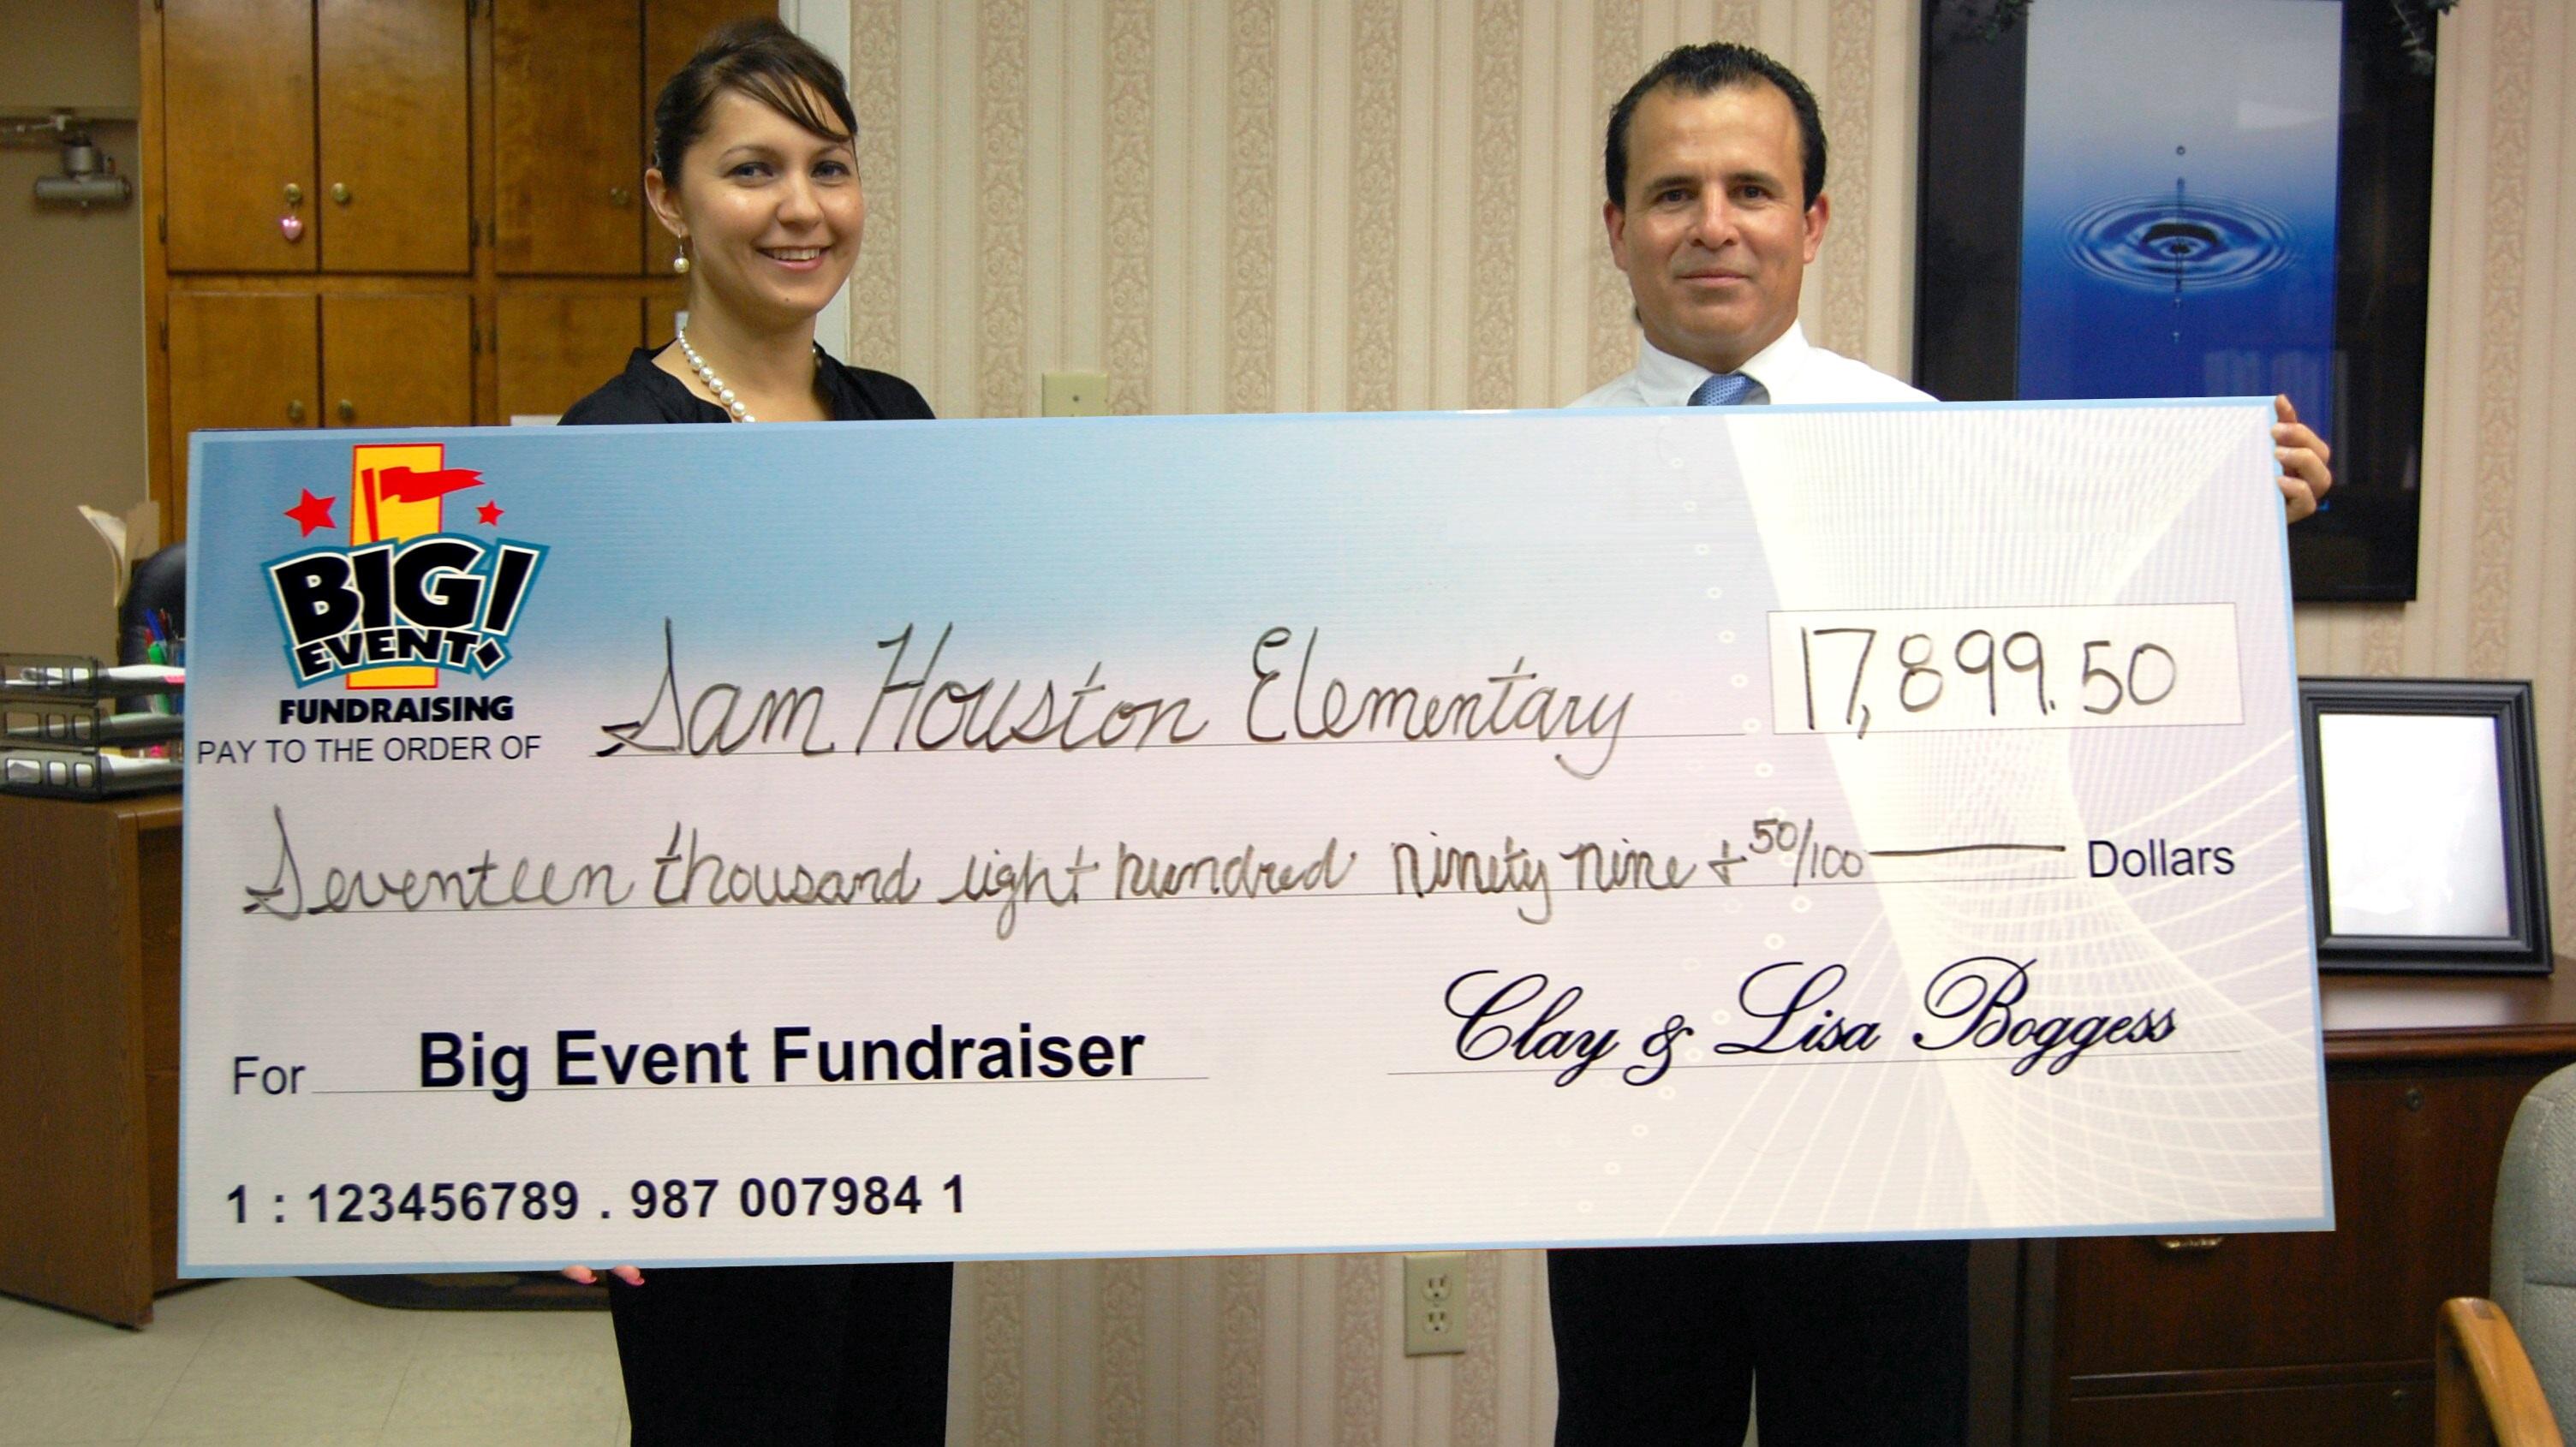 Sam Houston Elementary School fundraising team holding check